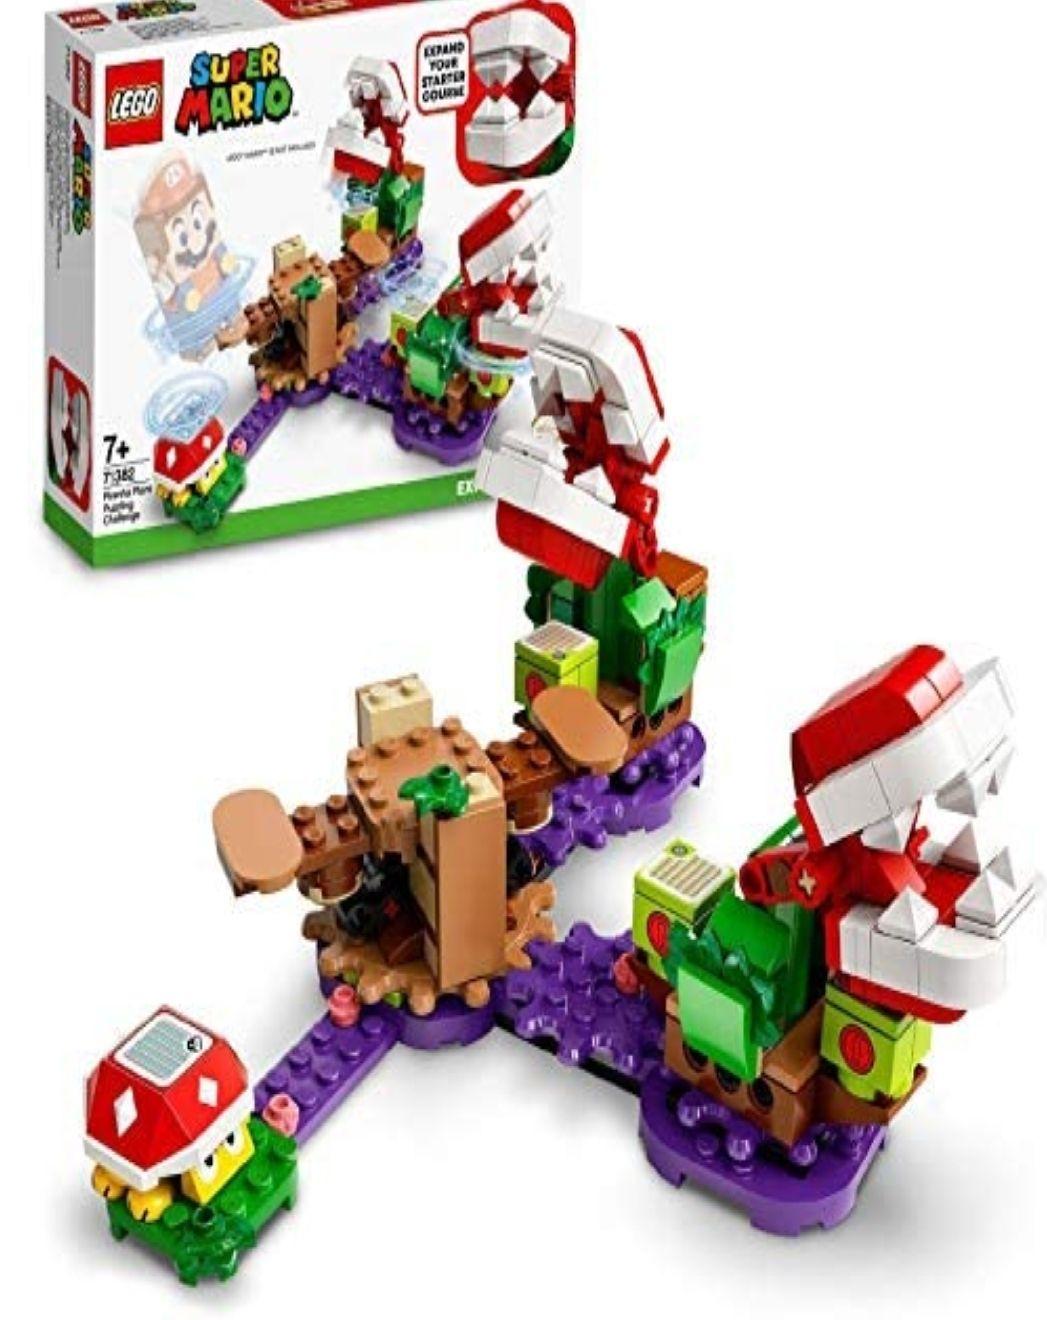 LEGOSuperMario71382 PiranhaPlantPuzzlingChallenge £15 from Amazon UK (free delivery with Prime or £4.49)